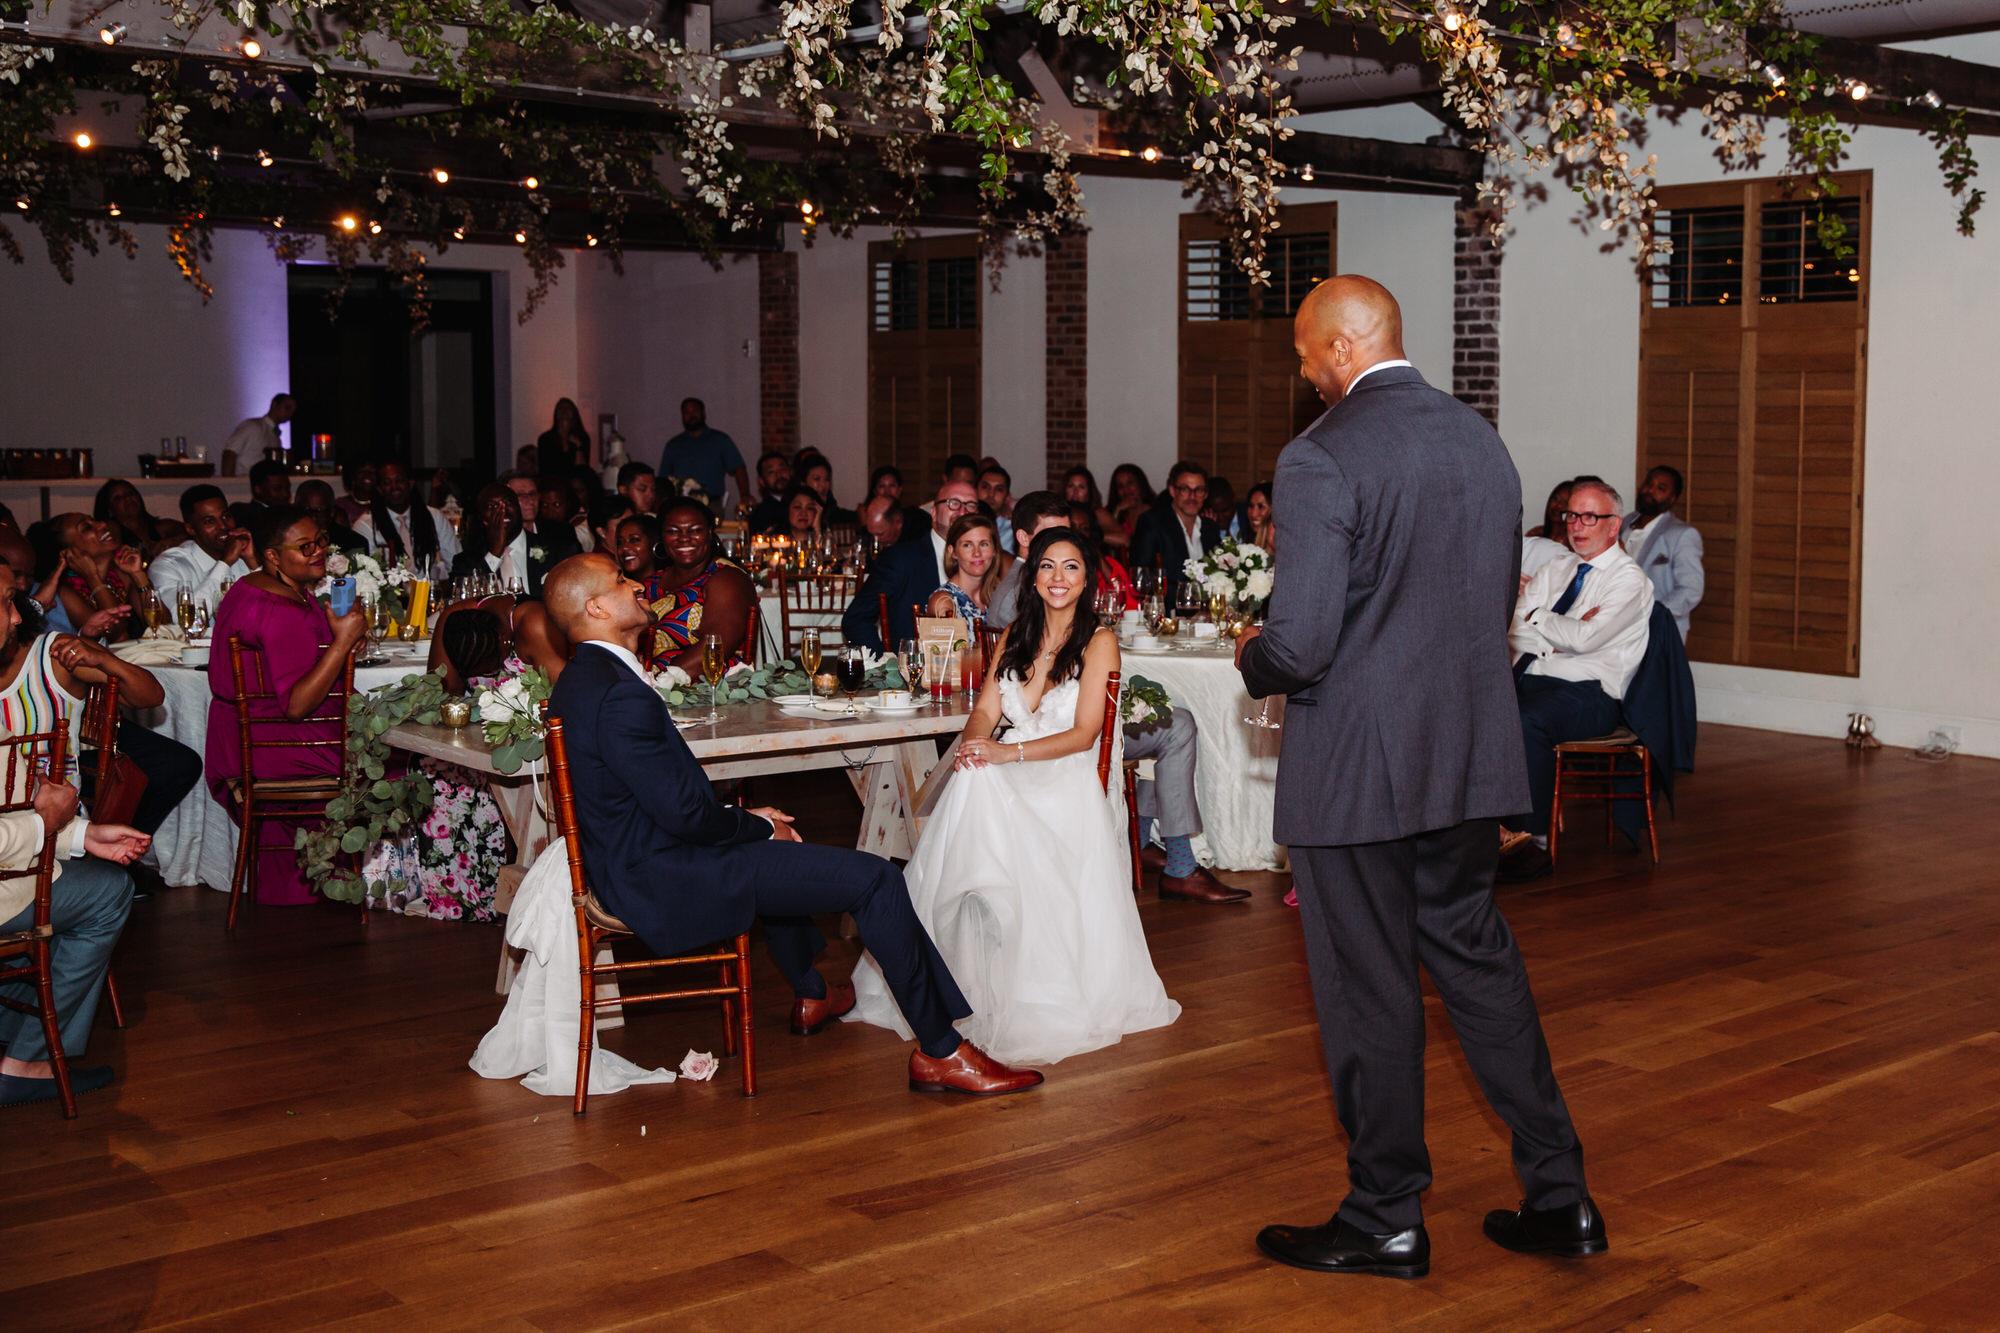 st-lukes-chapel-cannon-green-charleston-wedding-1008.JPG